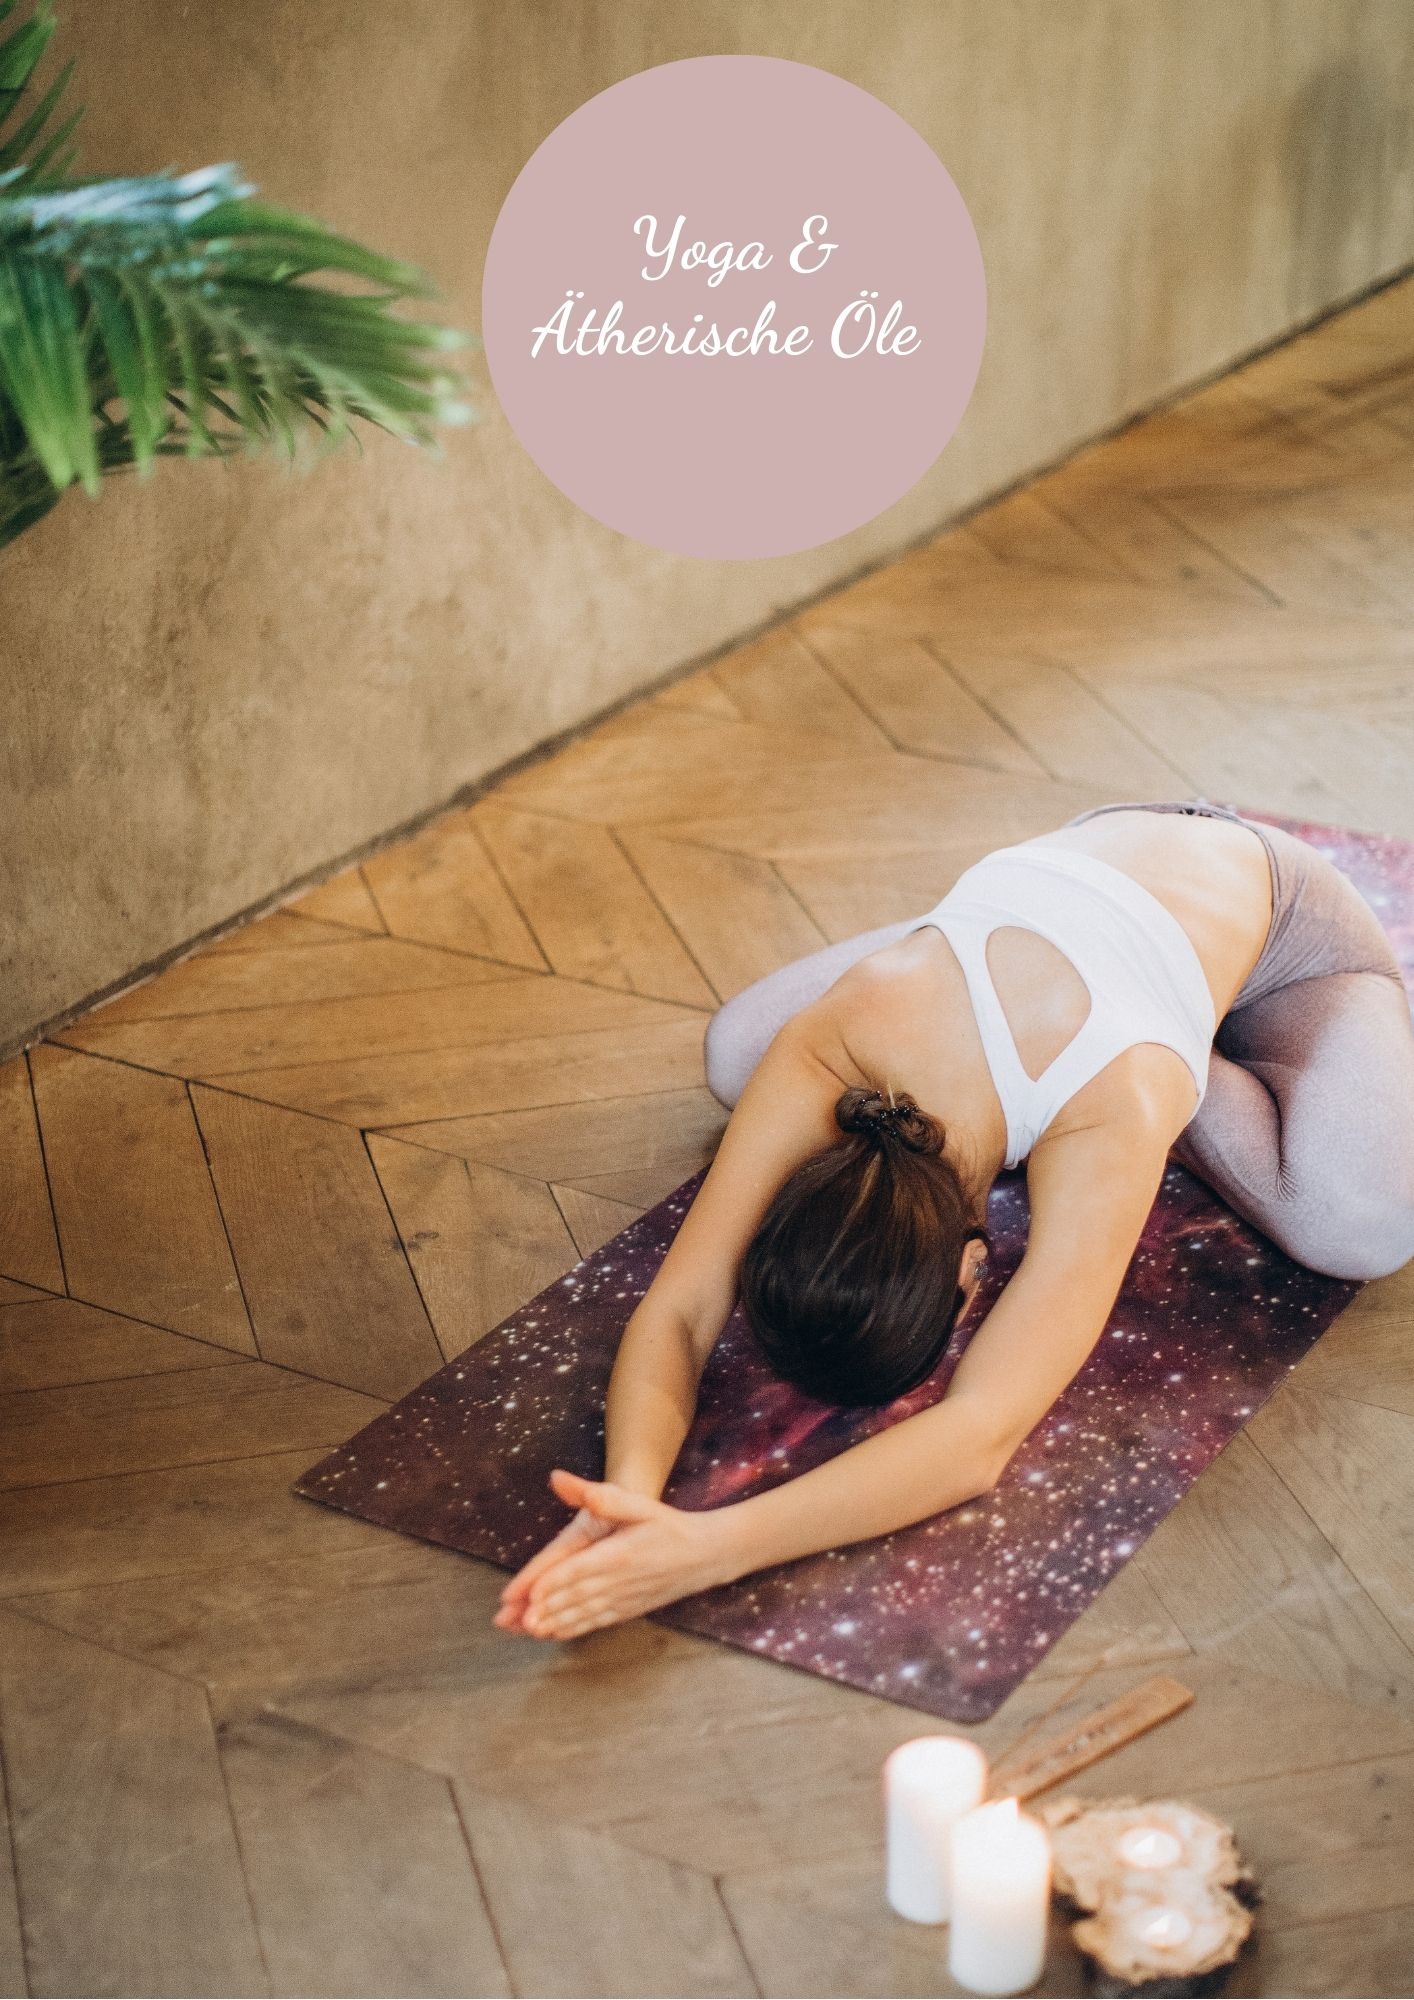 Yoga & Ätherische Öle